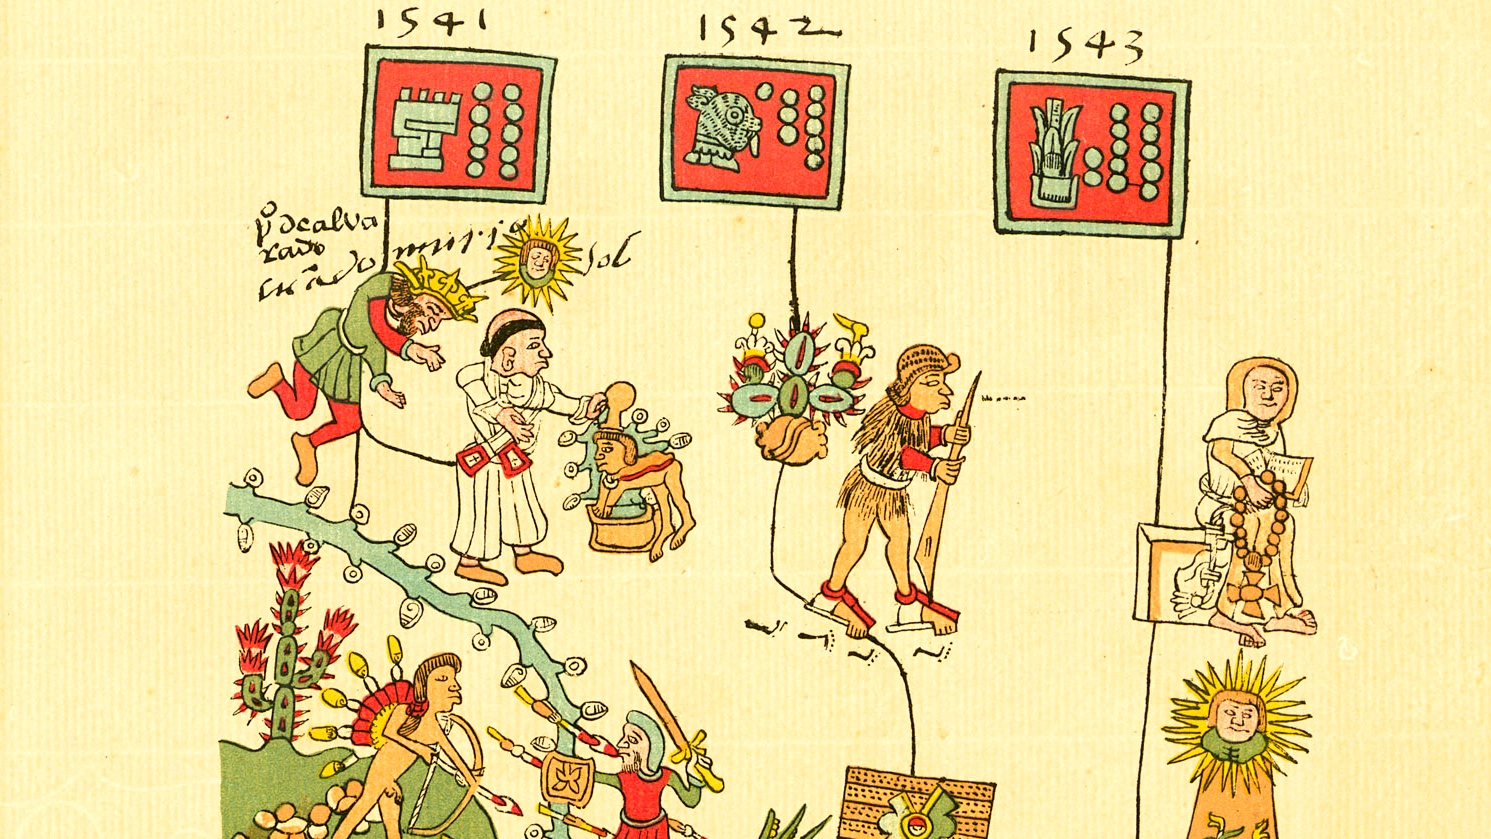 Codex Telleriano-remensis, p. 46r.